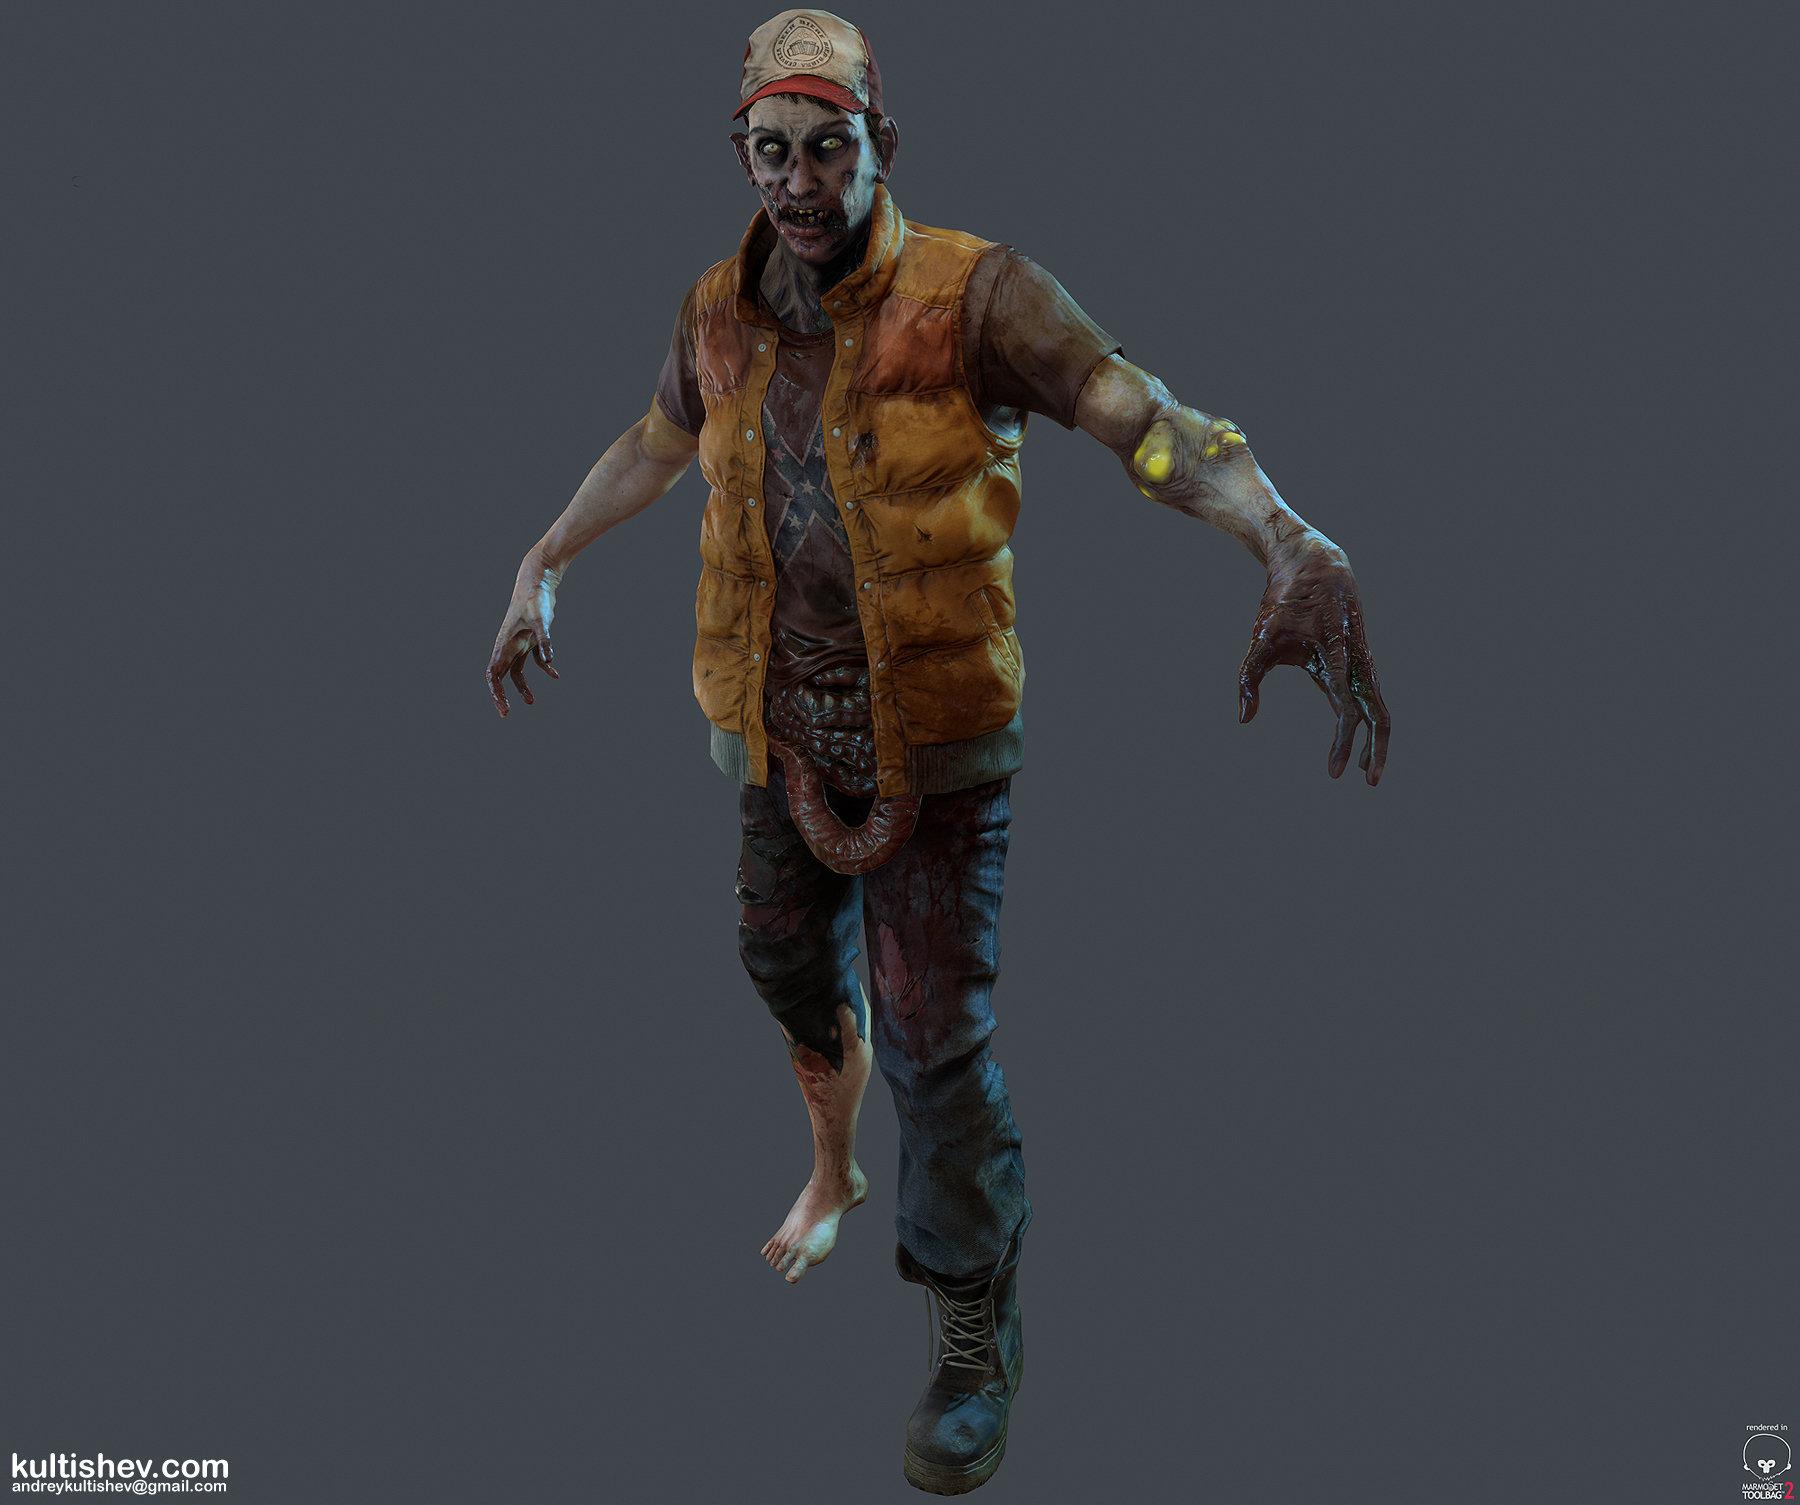 Andrey kultishev kultishev zombie lp